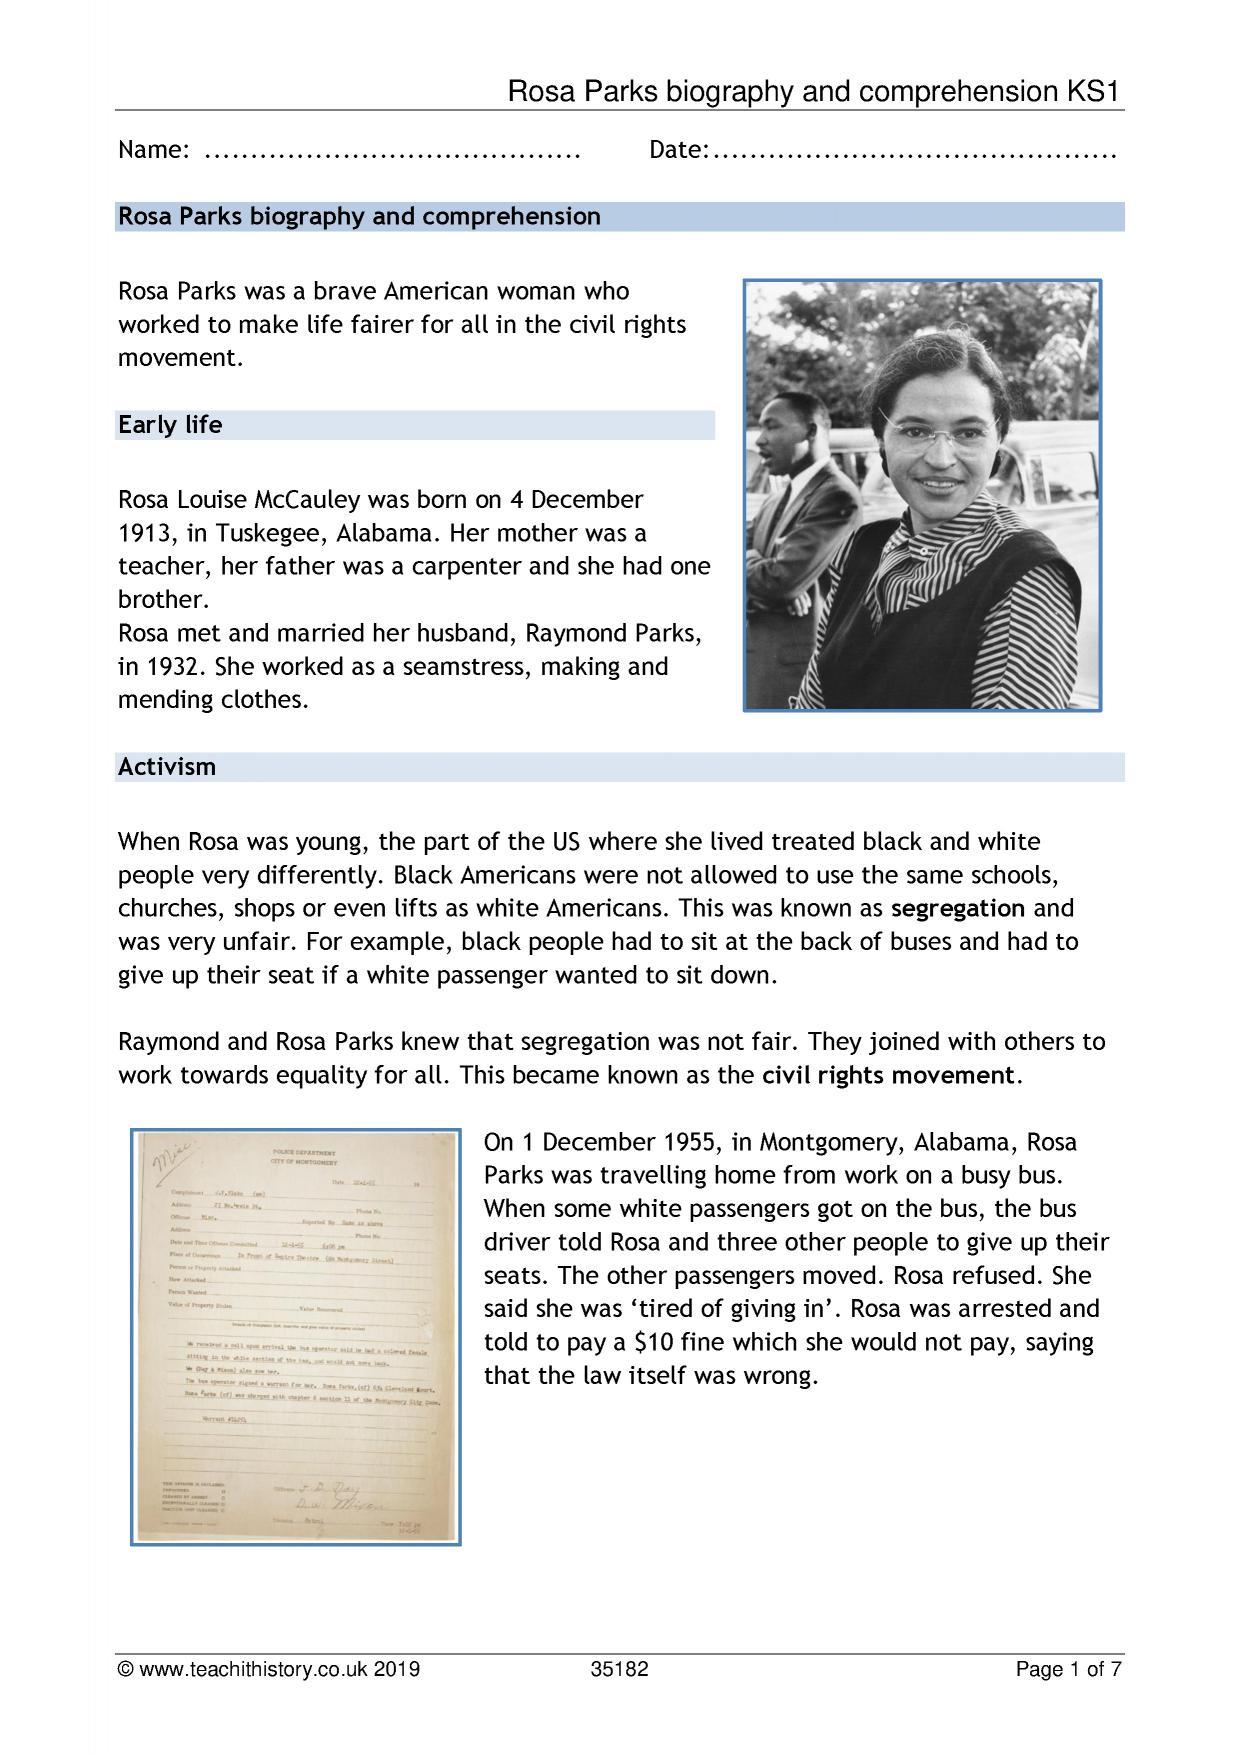 Rosa Parks Biography And Comprehension Ks1